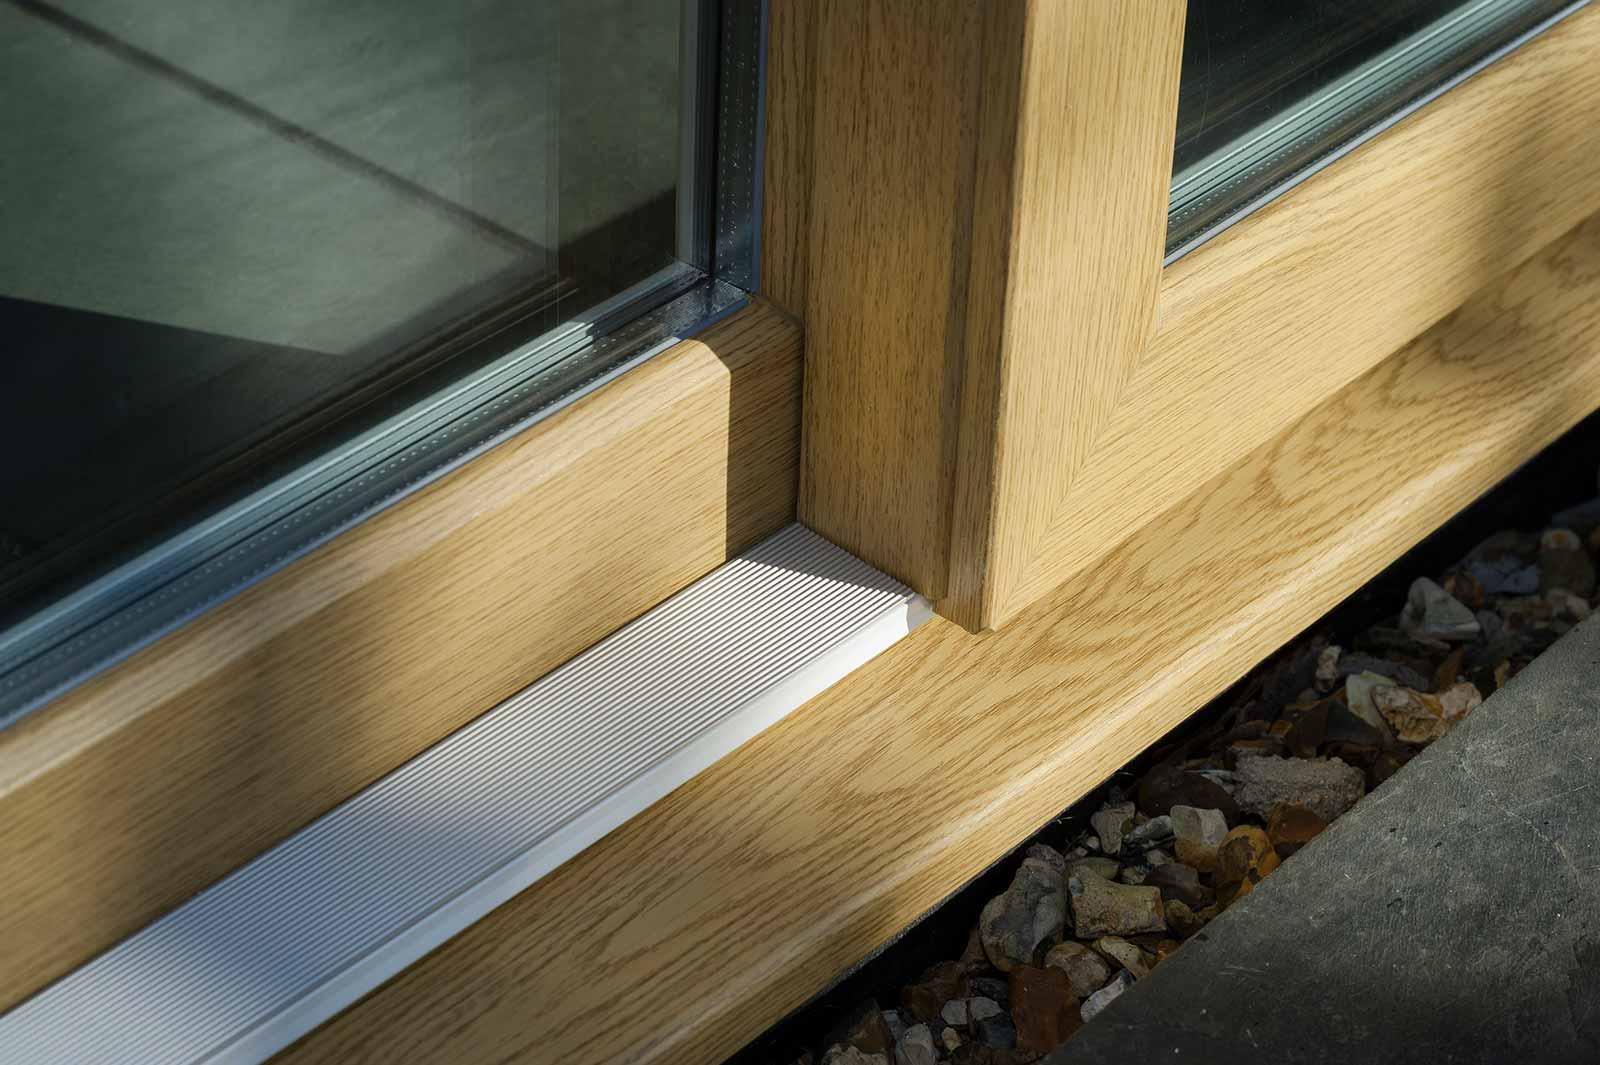 Upvc patio doors clacton on sea patio door prices essex for Cheap upvc patio doors